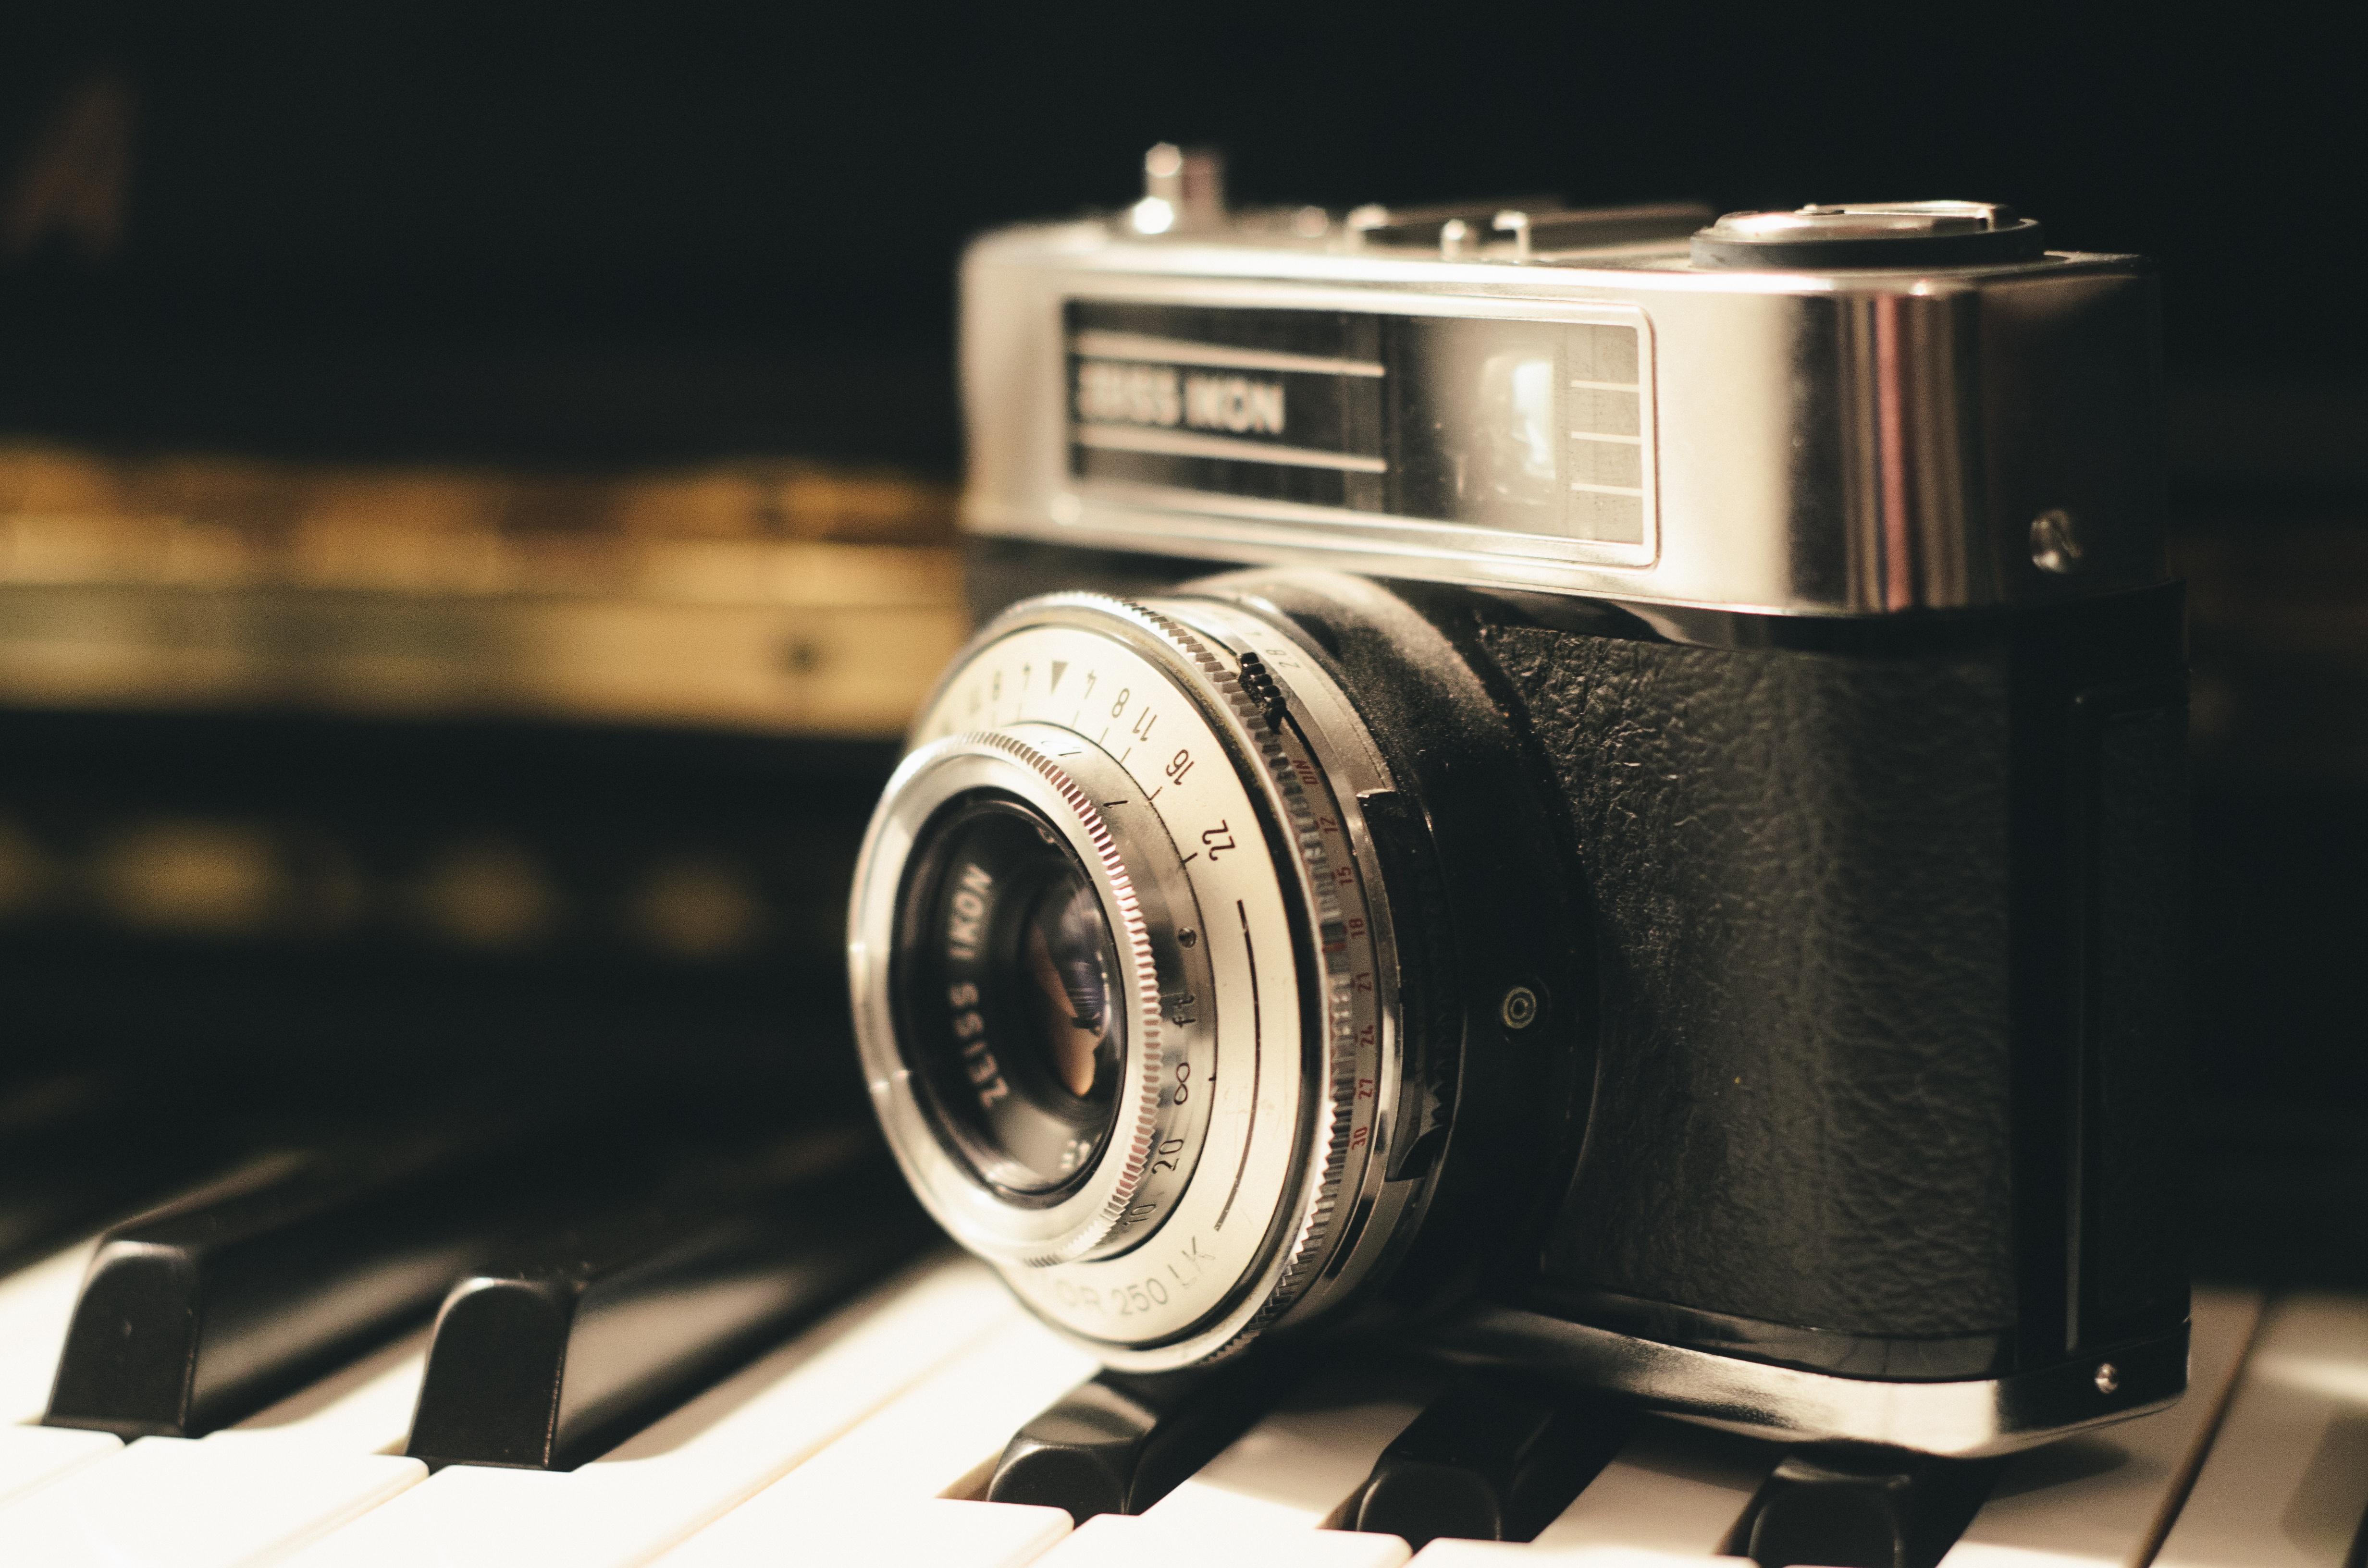 pianocamera-photography-vintage-lens_1.jpg